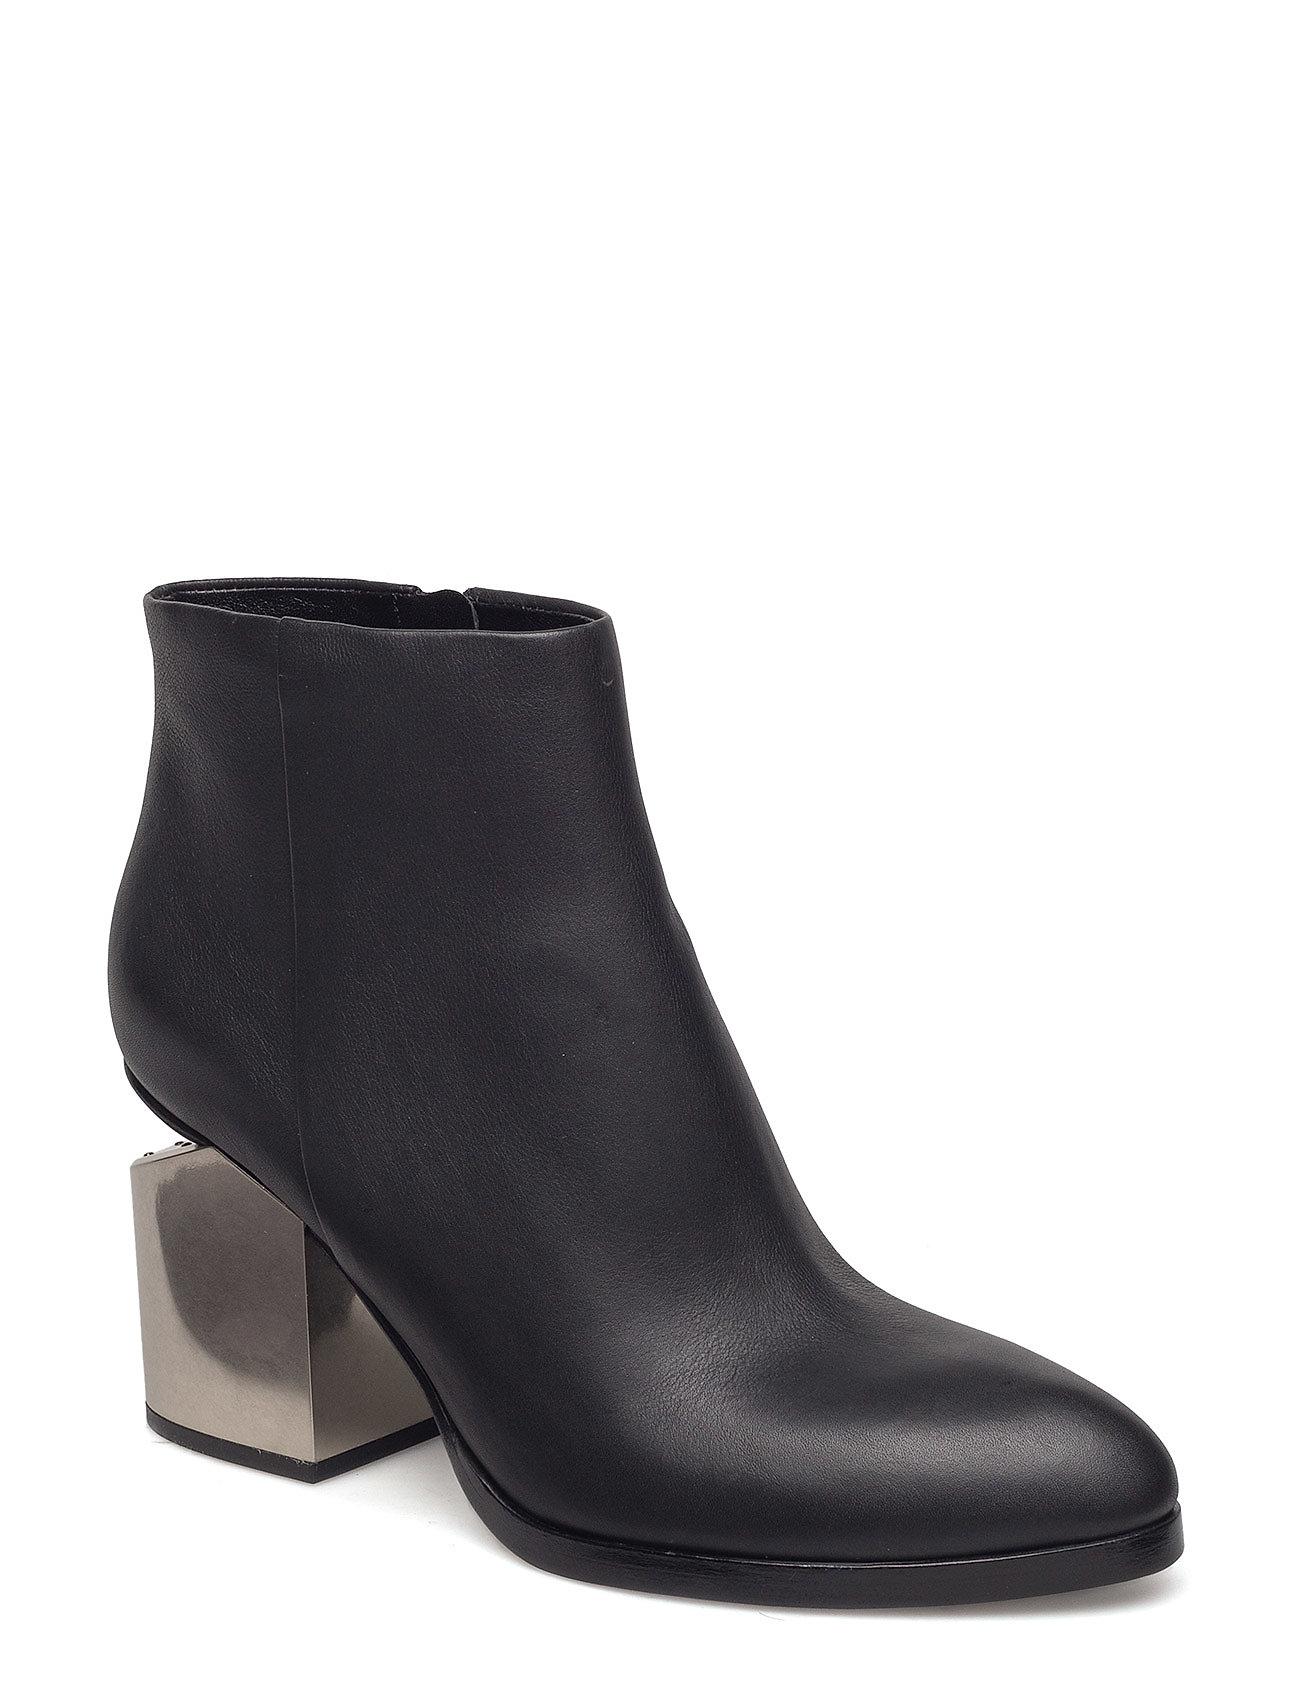 Gabi black tumbled calf/silver metal heel fra alexander wang på boozt.com dk